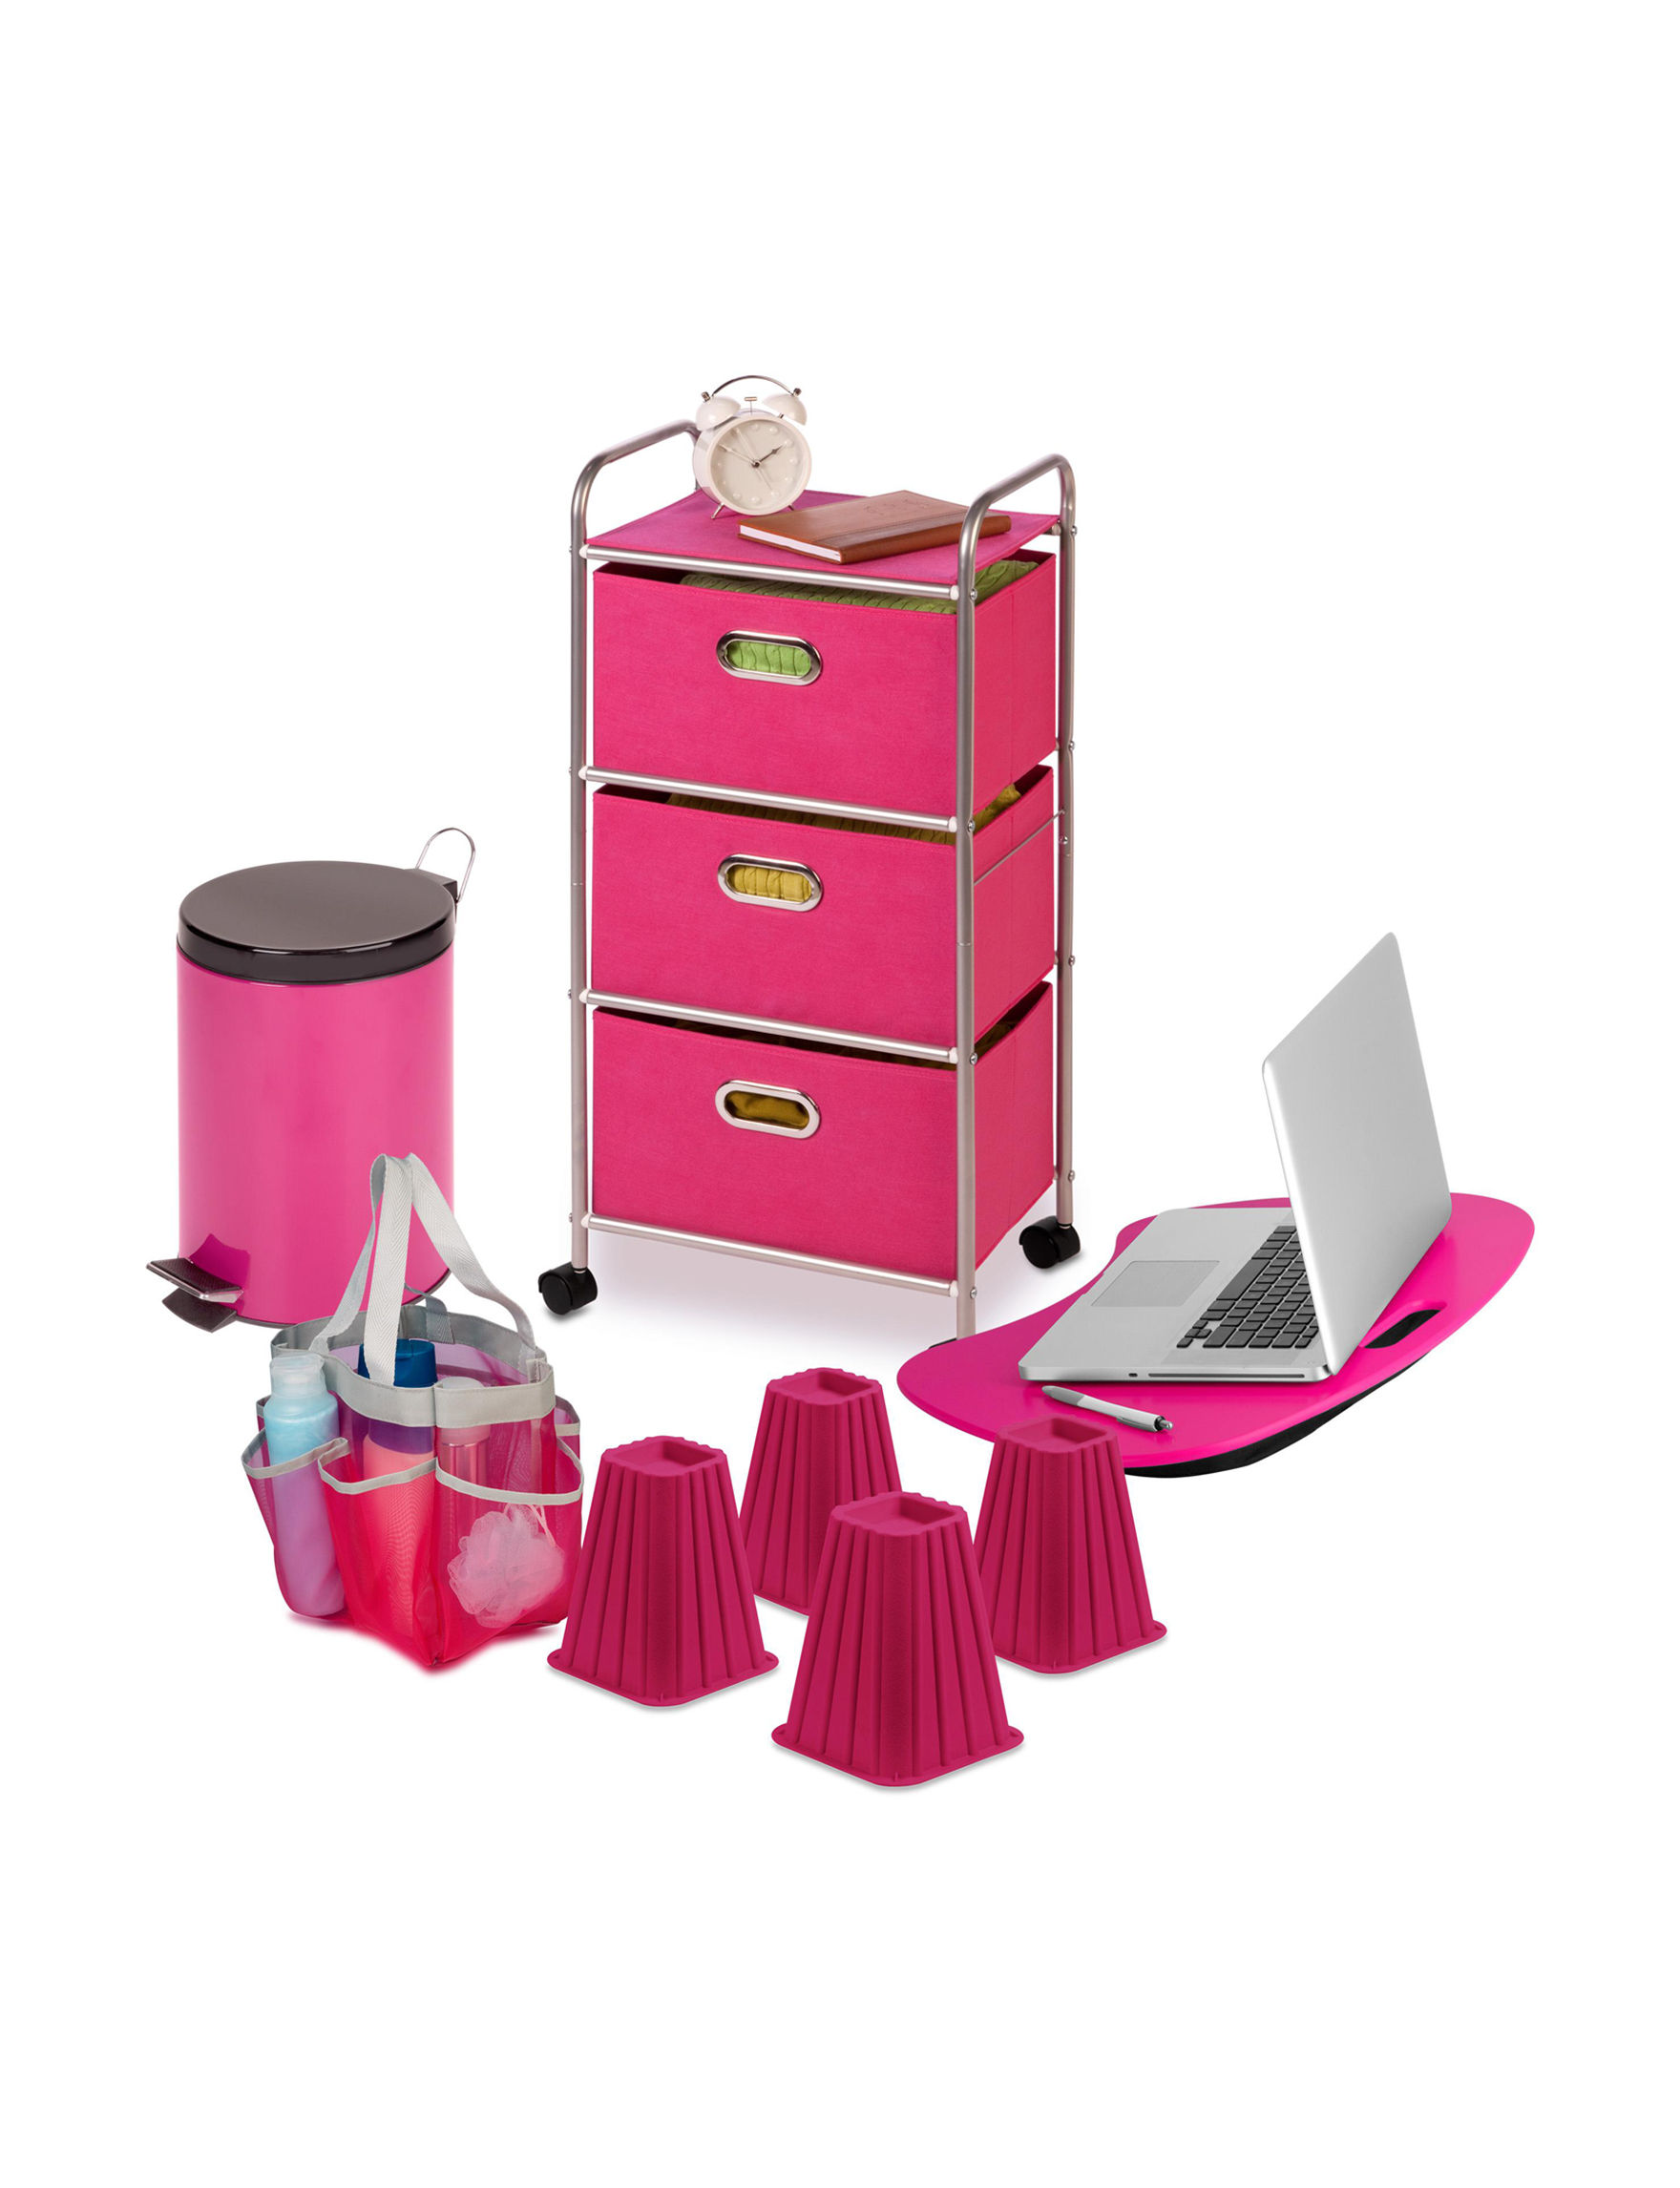 Honey-Can-Do International Pink Carts & Drawers Storage & Organization